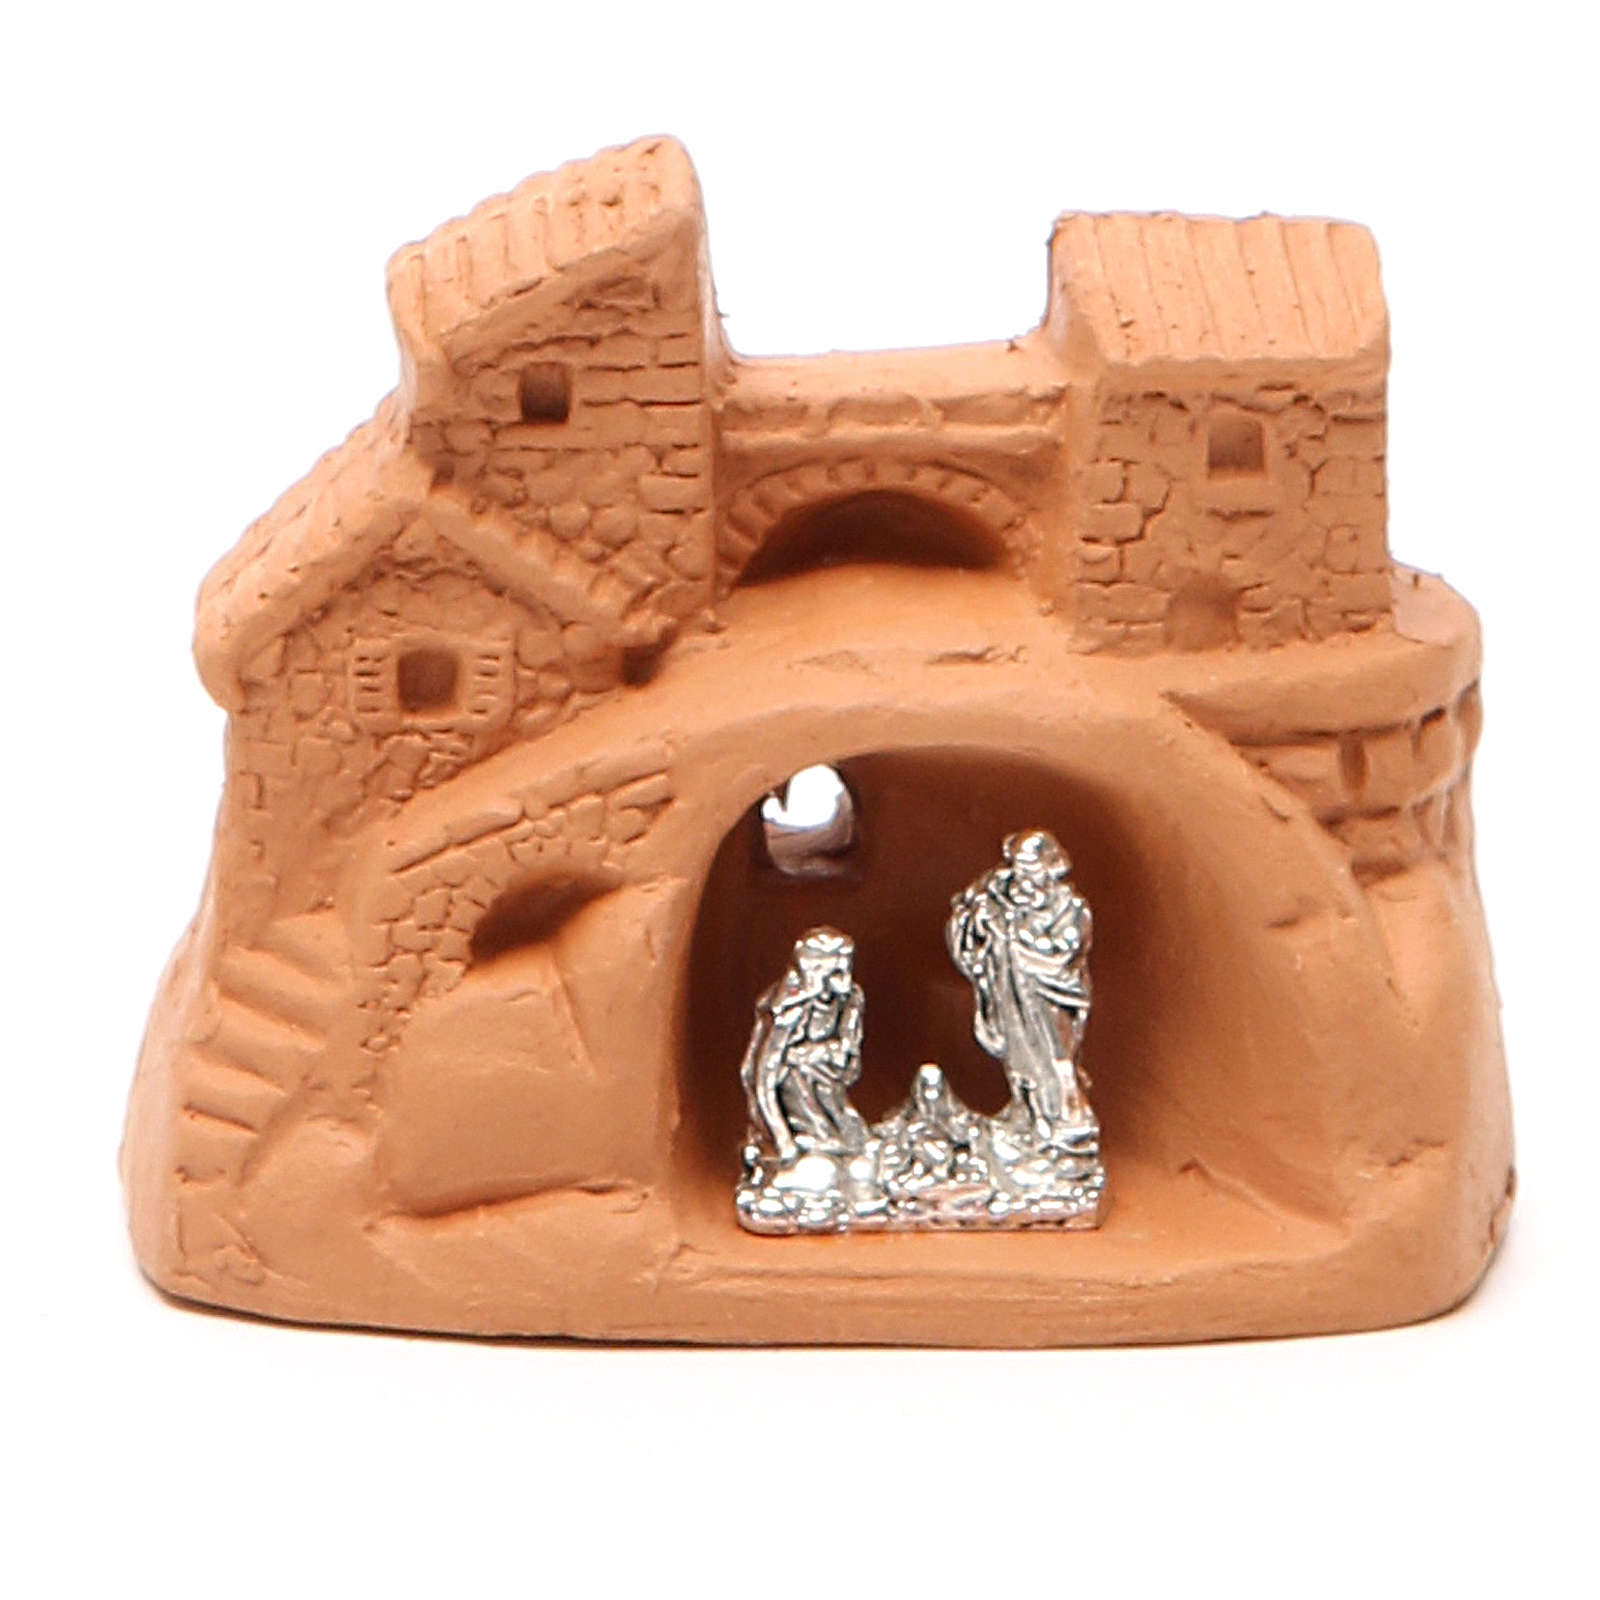 Nativity natural terracotta 6x7x4cm 4